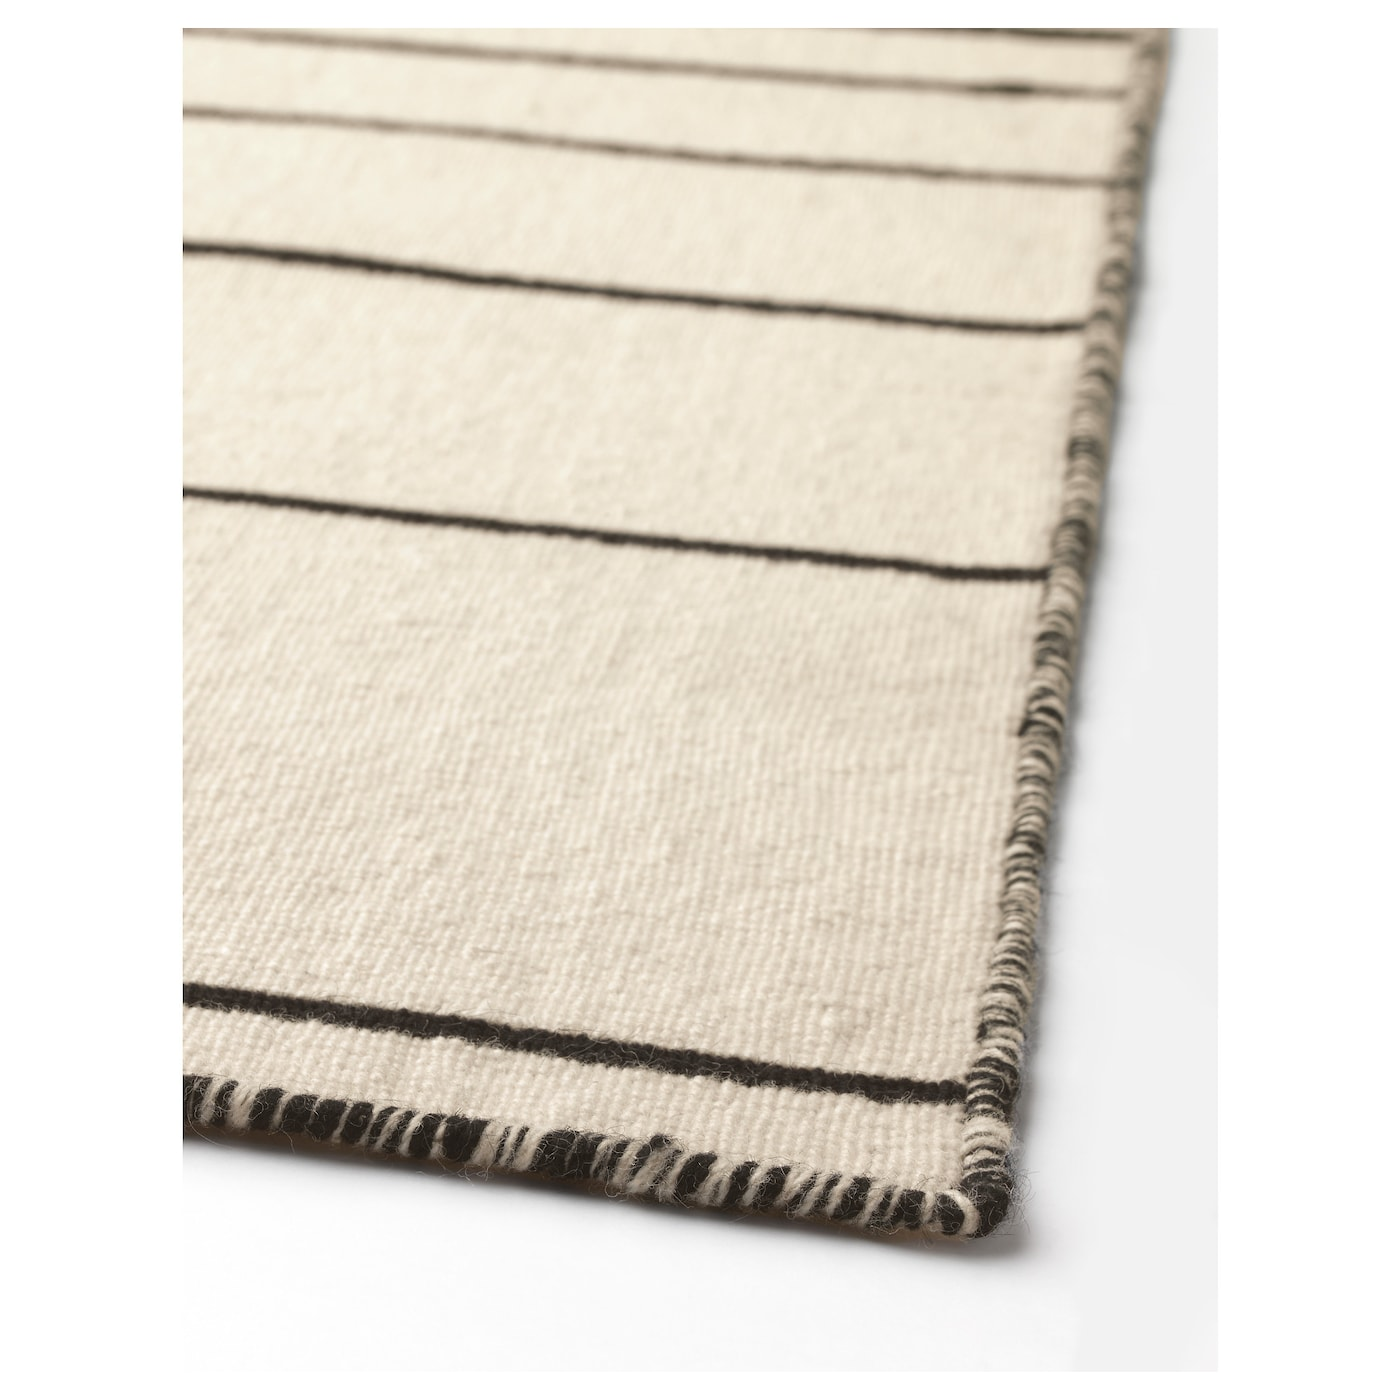 ristinge rug flatwoven handmade off white black 200x300 cm ikea. Black Bedroom Furniture Sets. Home Design Ideas